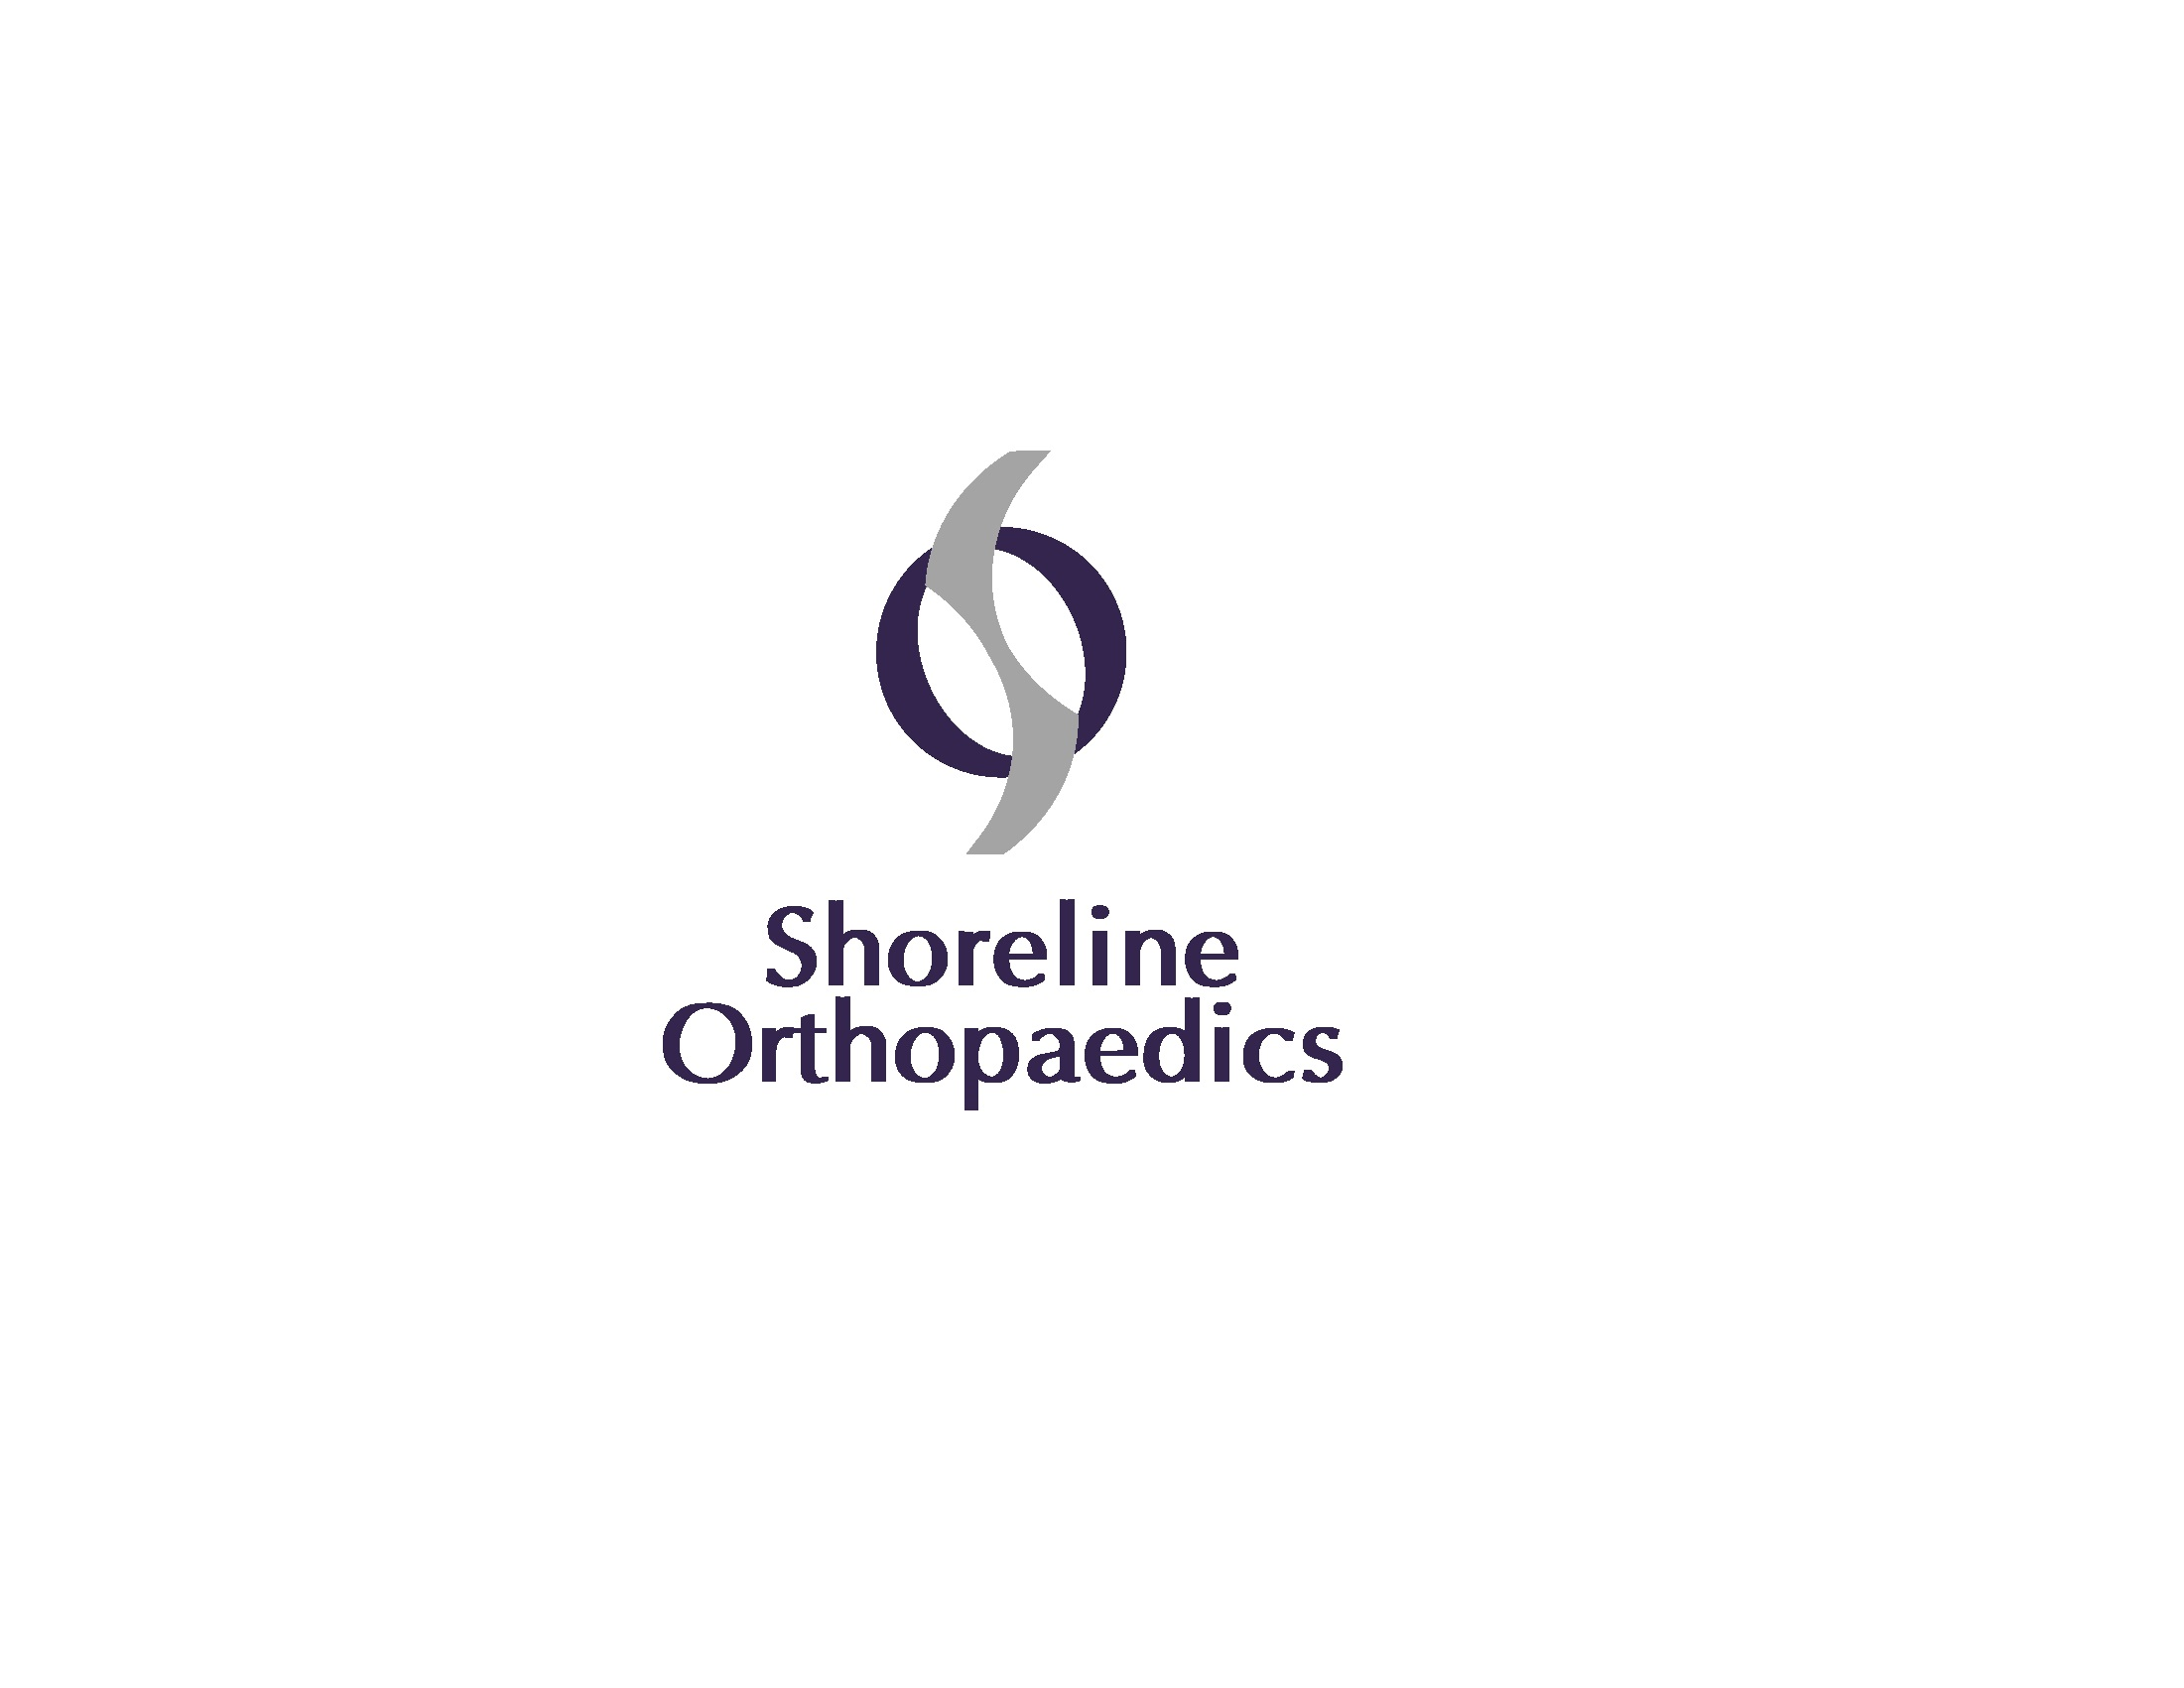 Shoreline Orthopaedics.jpg